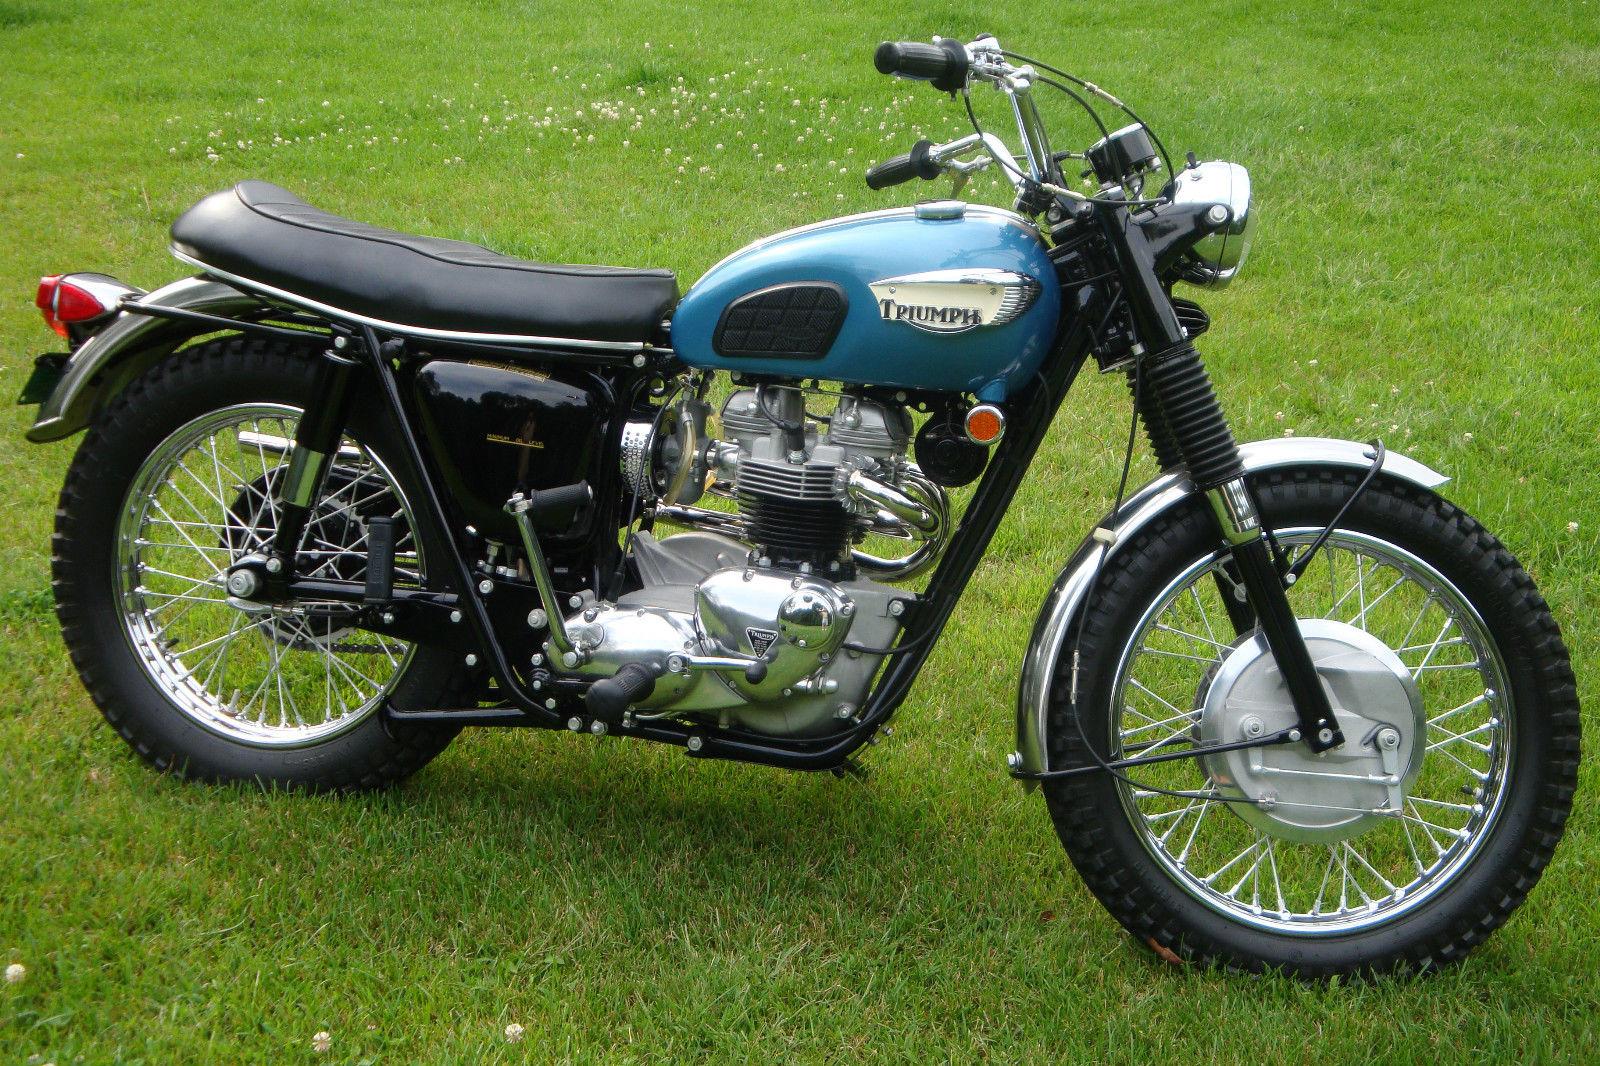 Restored Triumph Trophy Tr6c 1968 Photographs At Classic Bikes Restored Bikes Restored